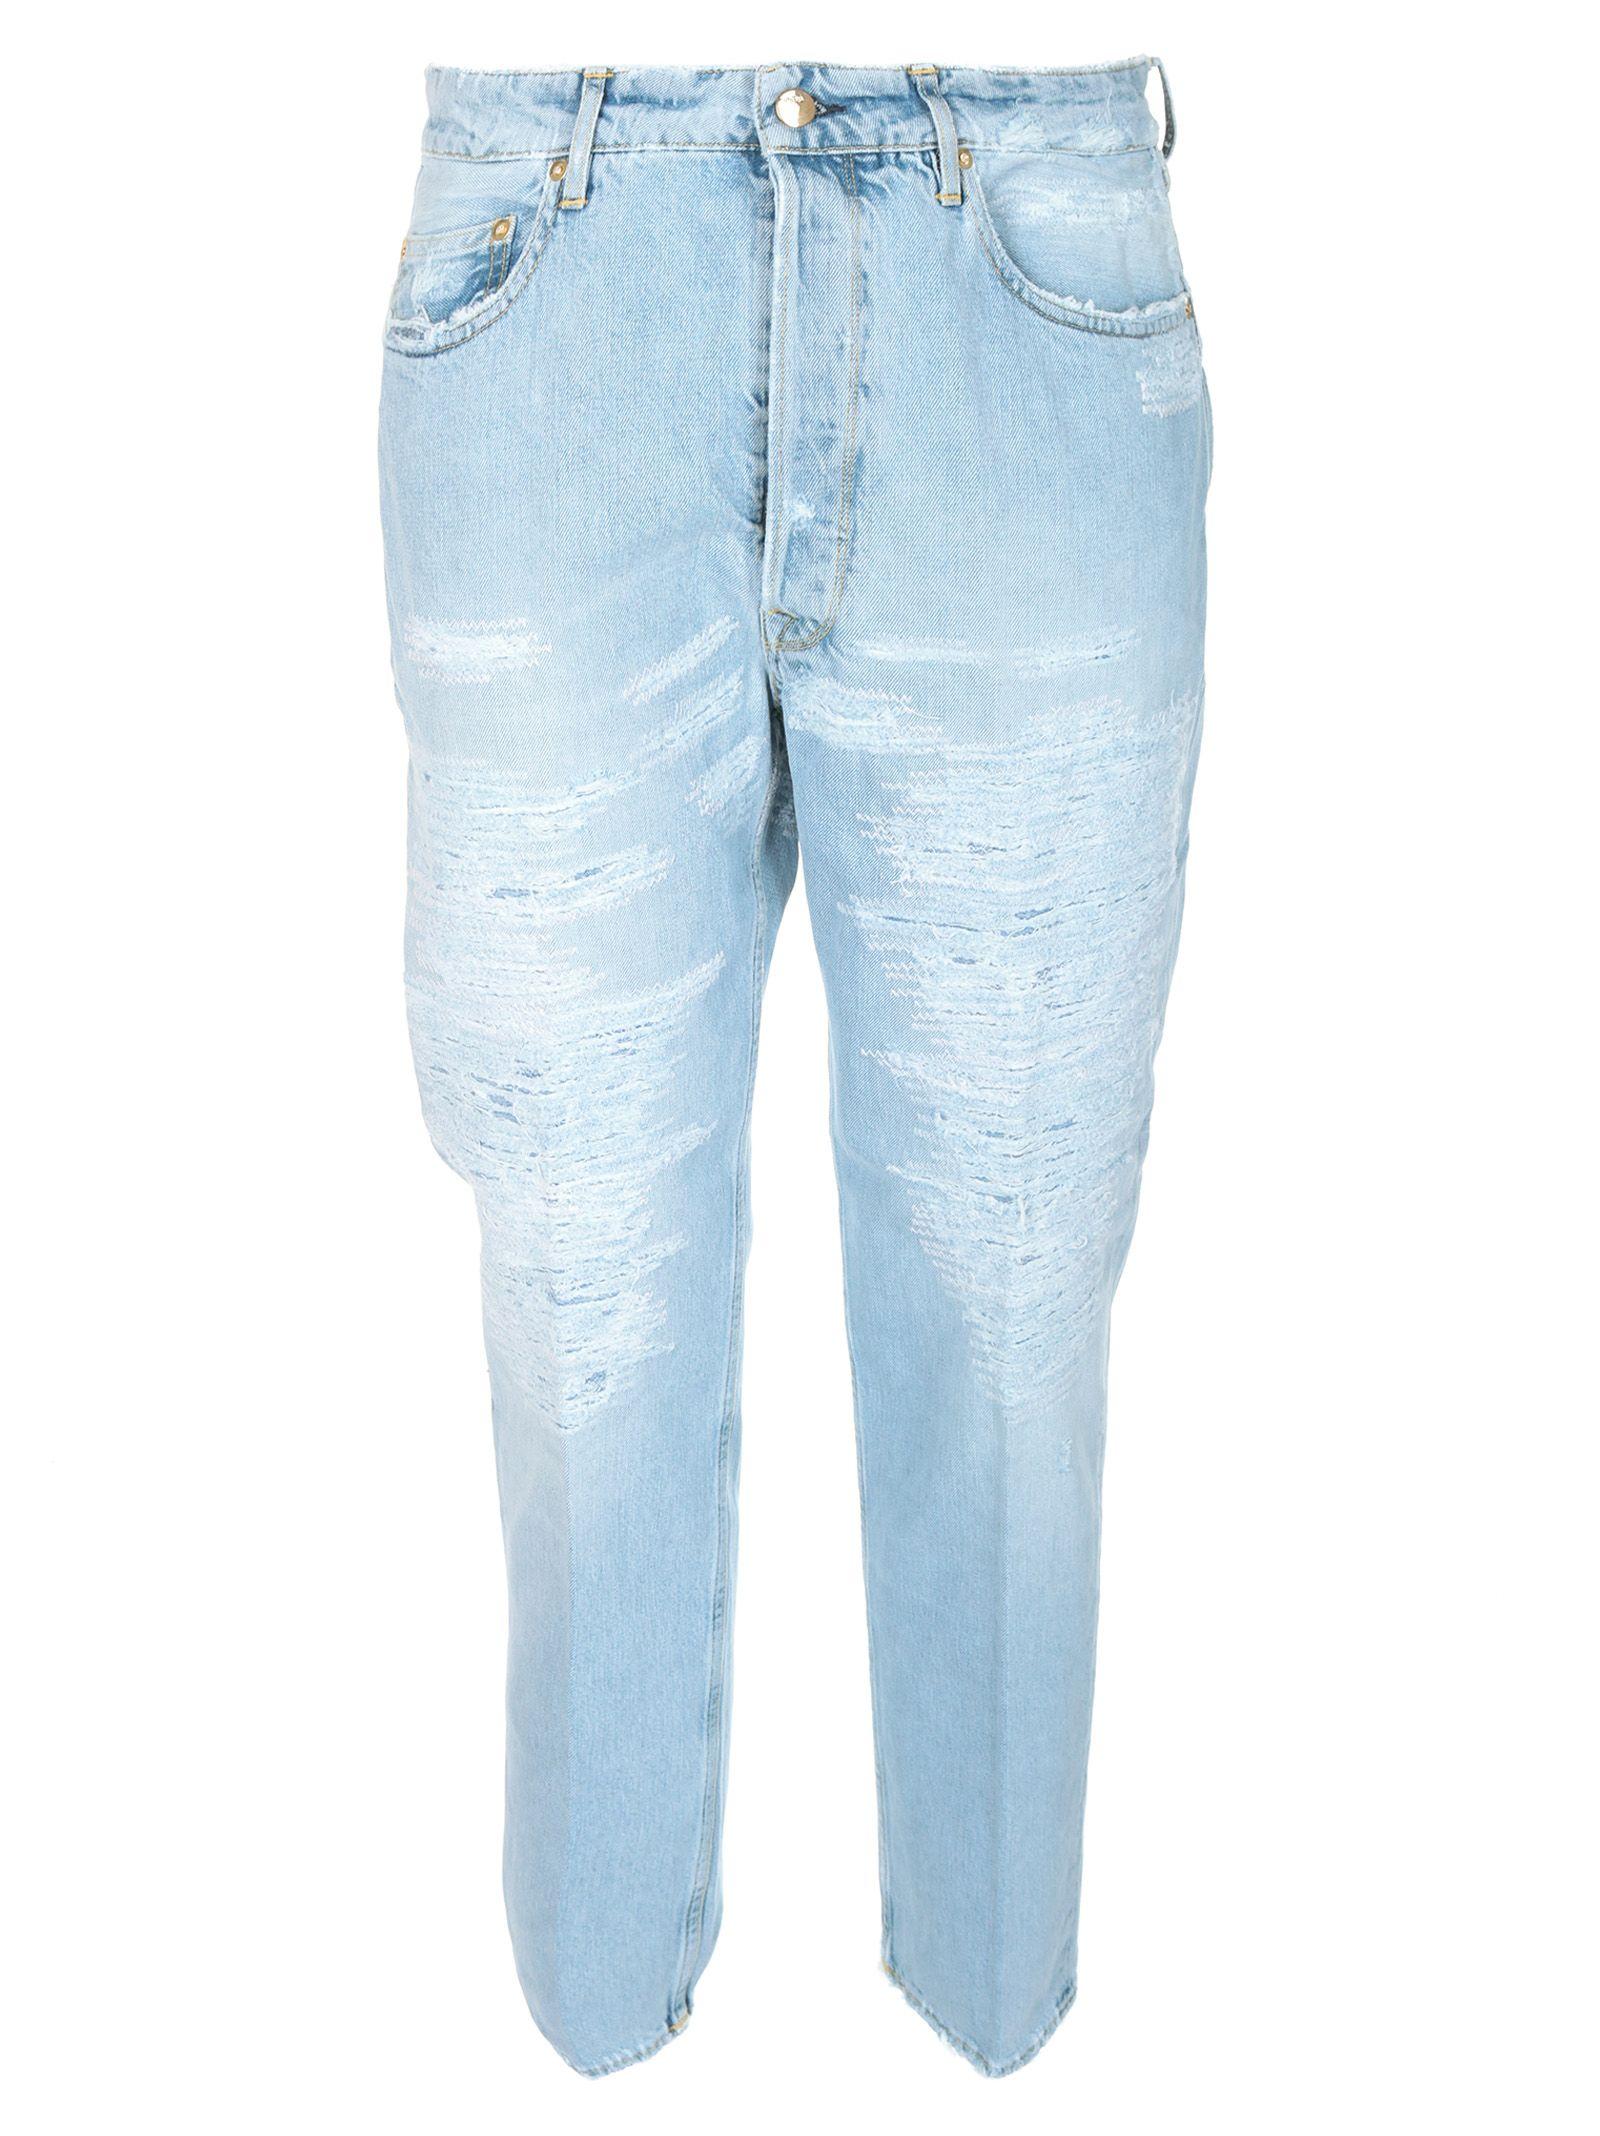 Golden Goose Happy Distressed Jeans